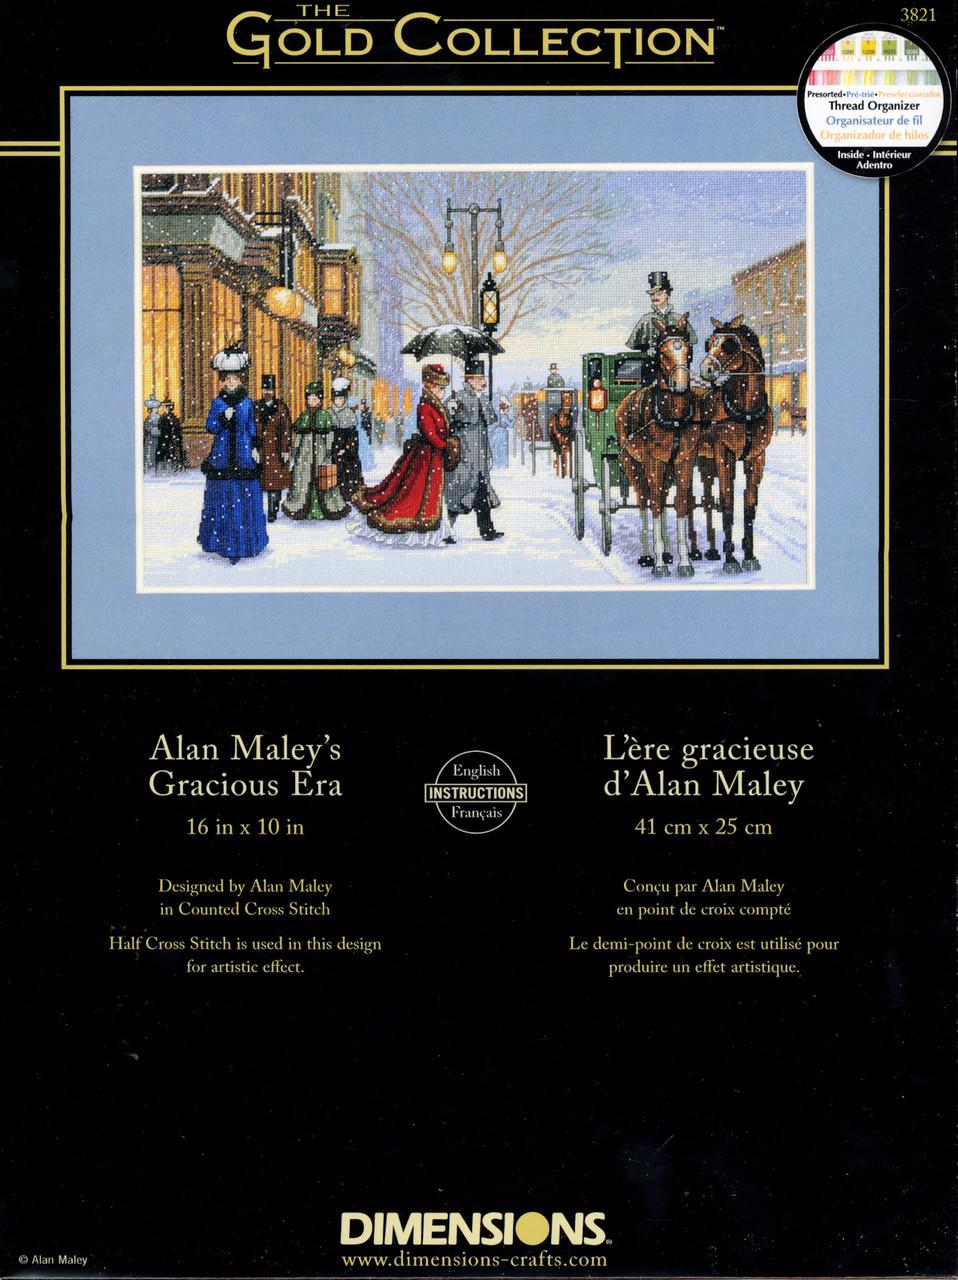 Gold Collection - Alan Maley's Gracious Era